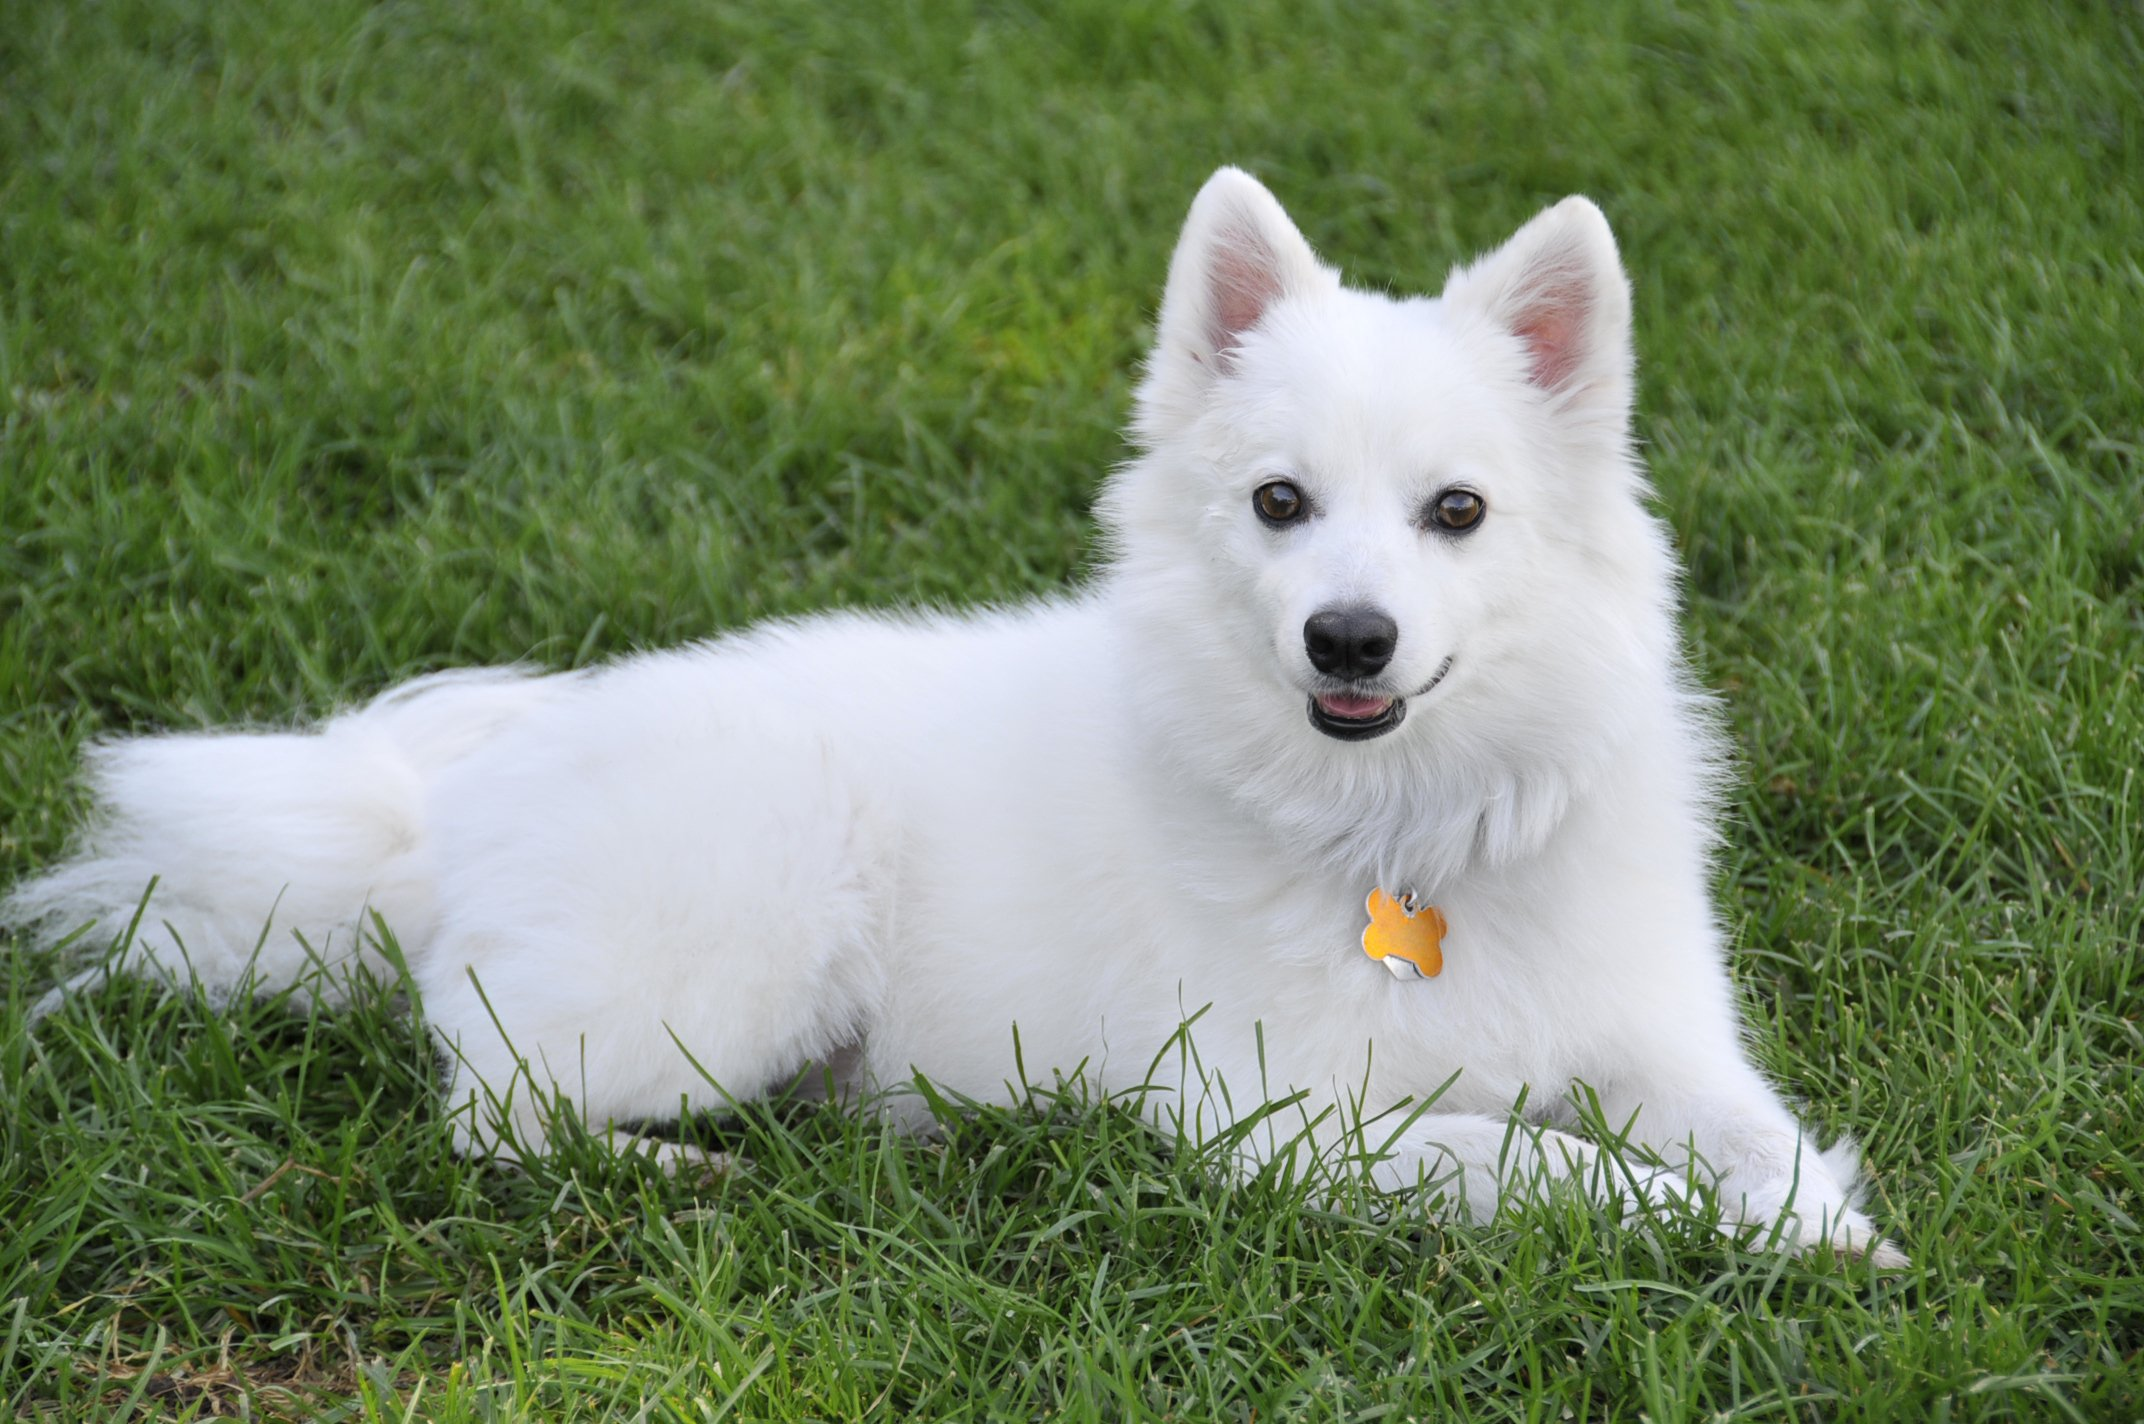 American Eskimo Dog resting on grass.